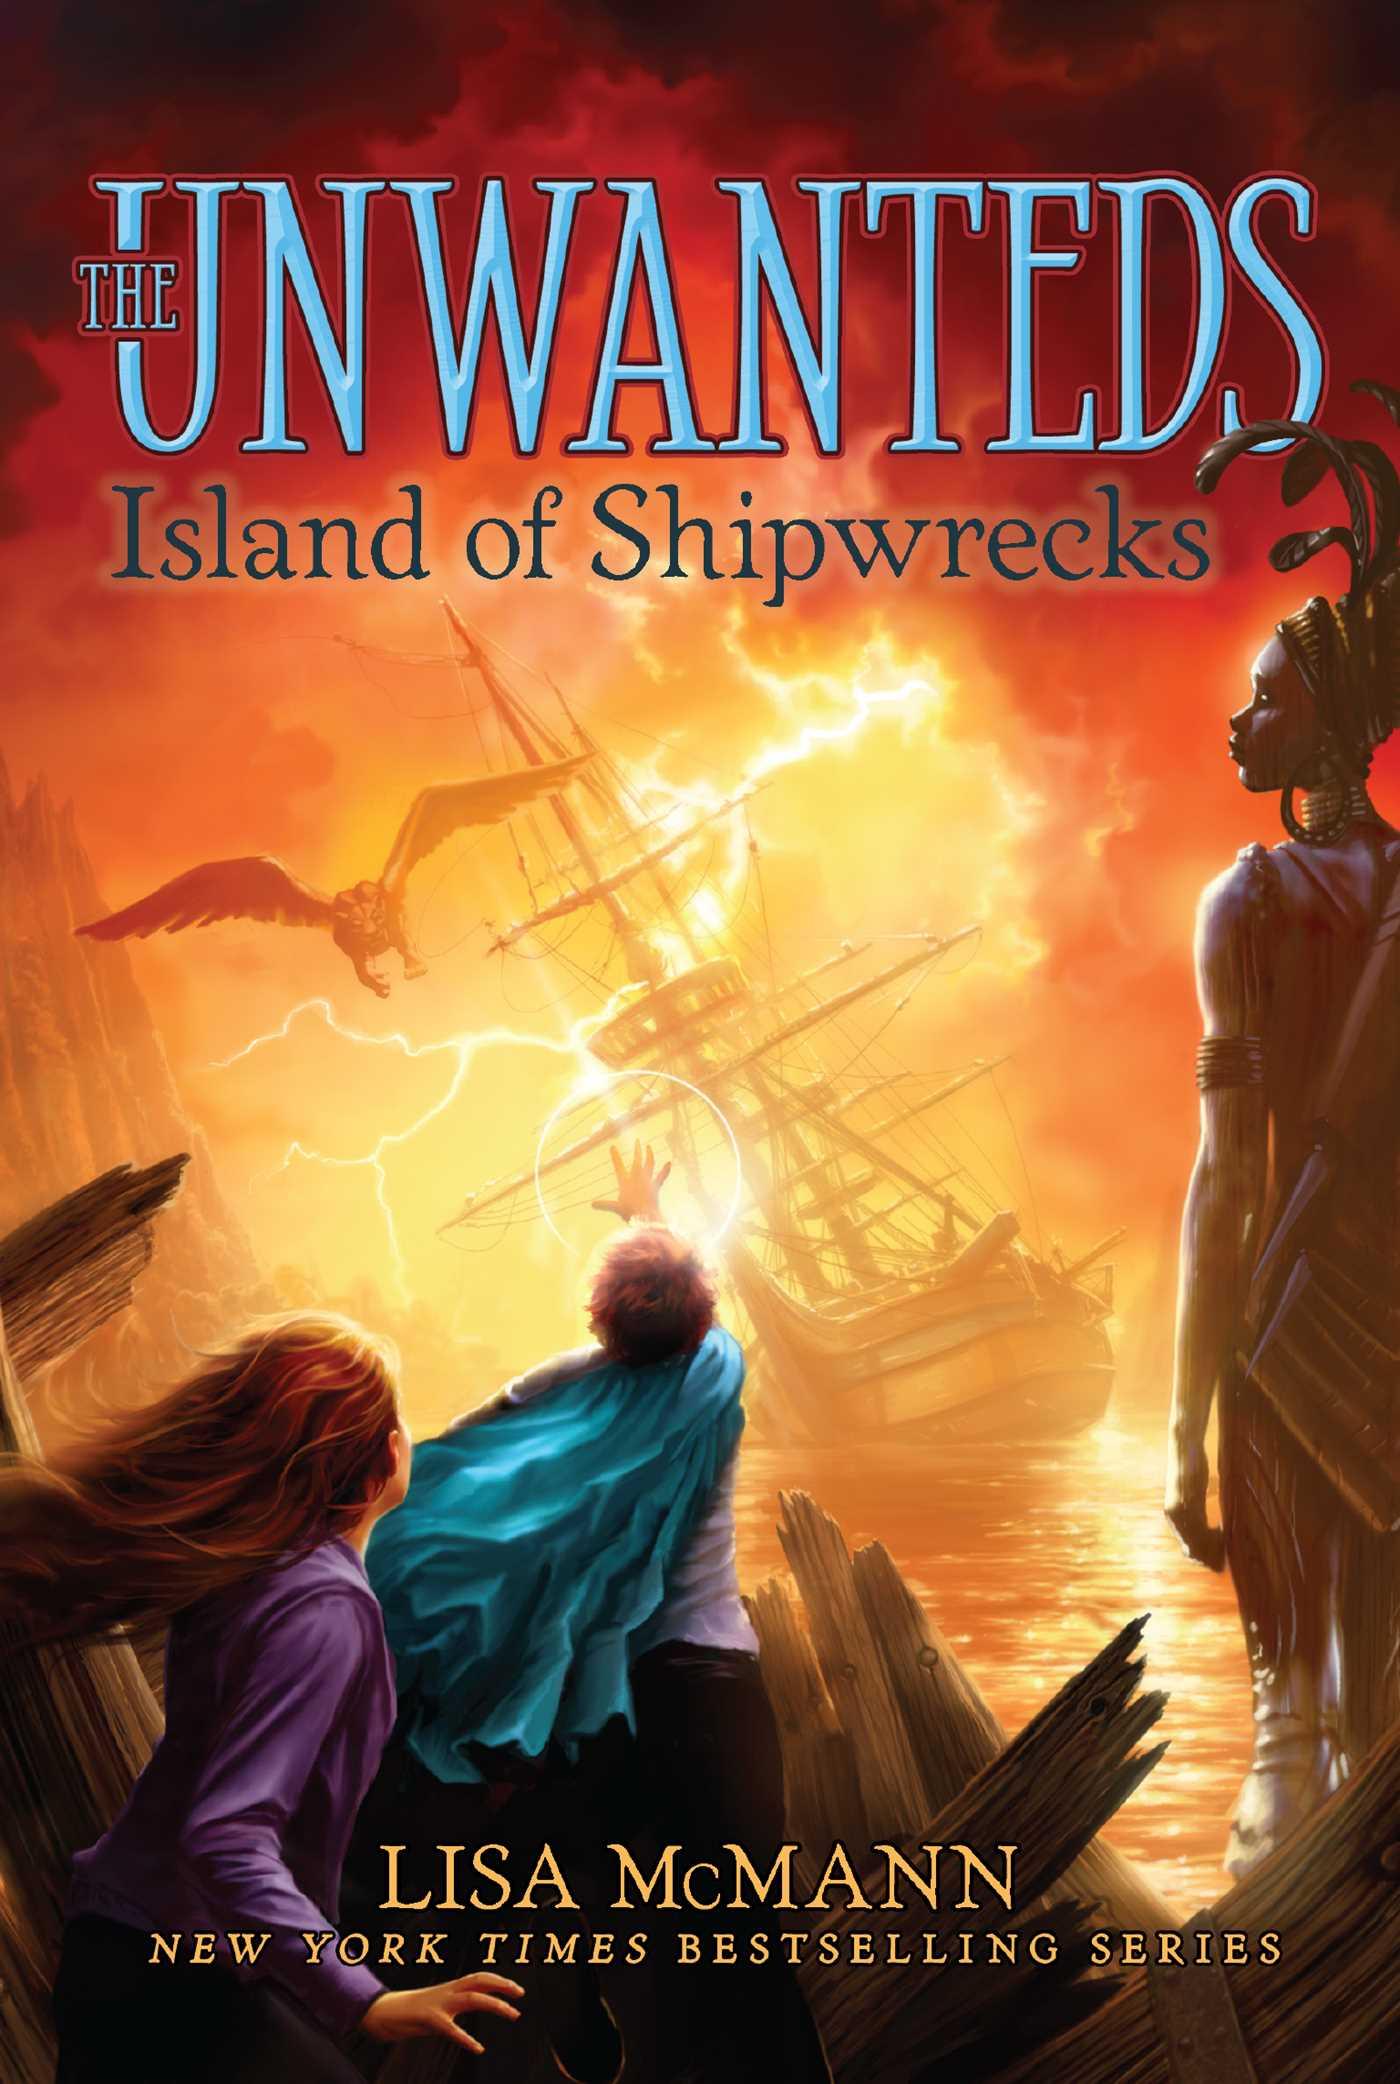 Island of shipwrecks 9781442493315 hr